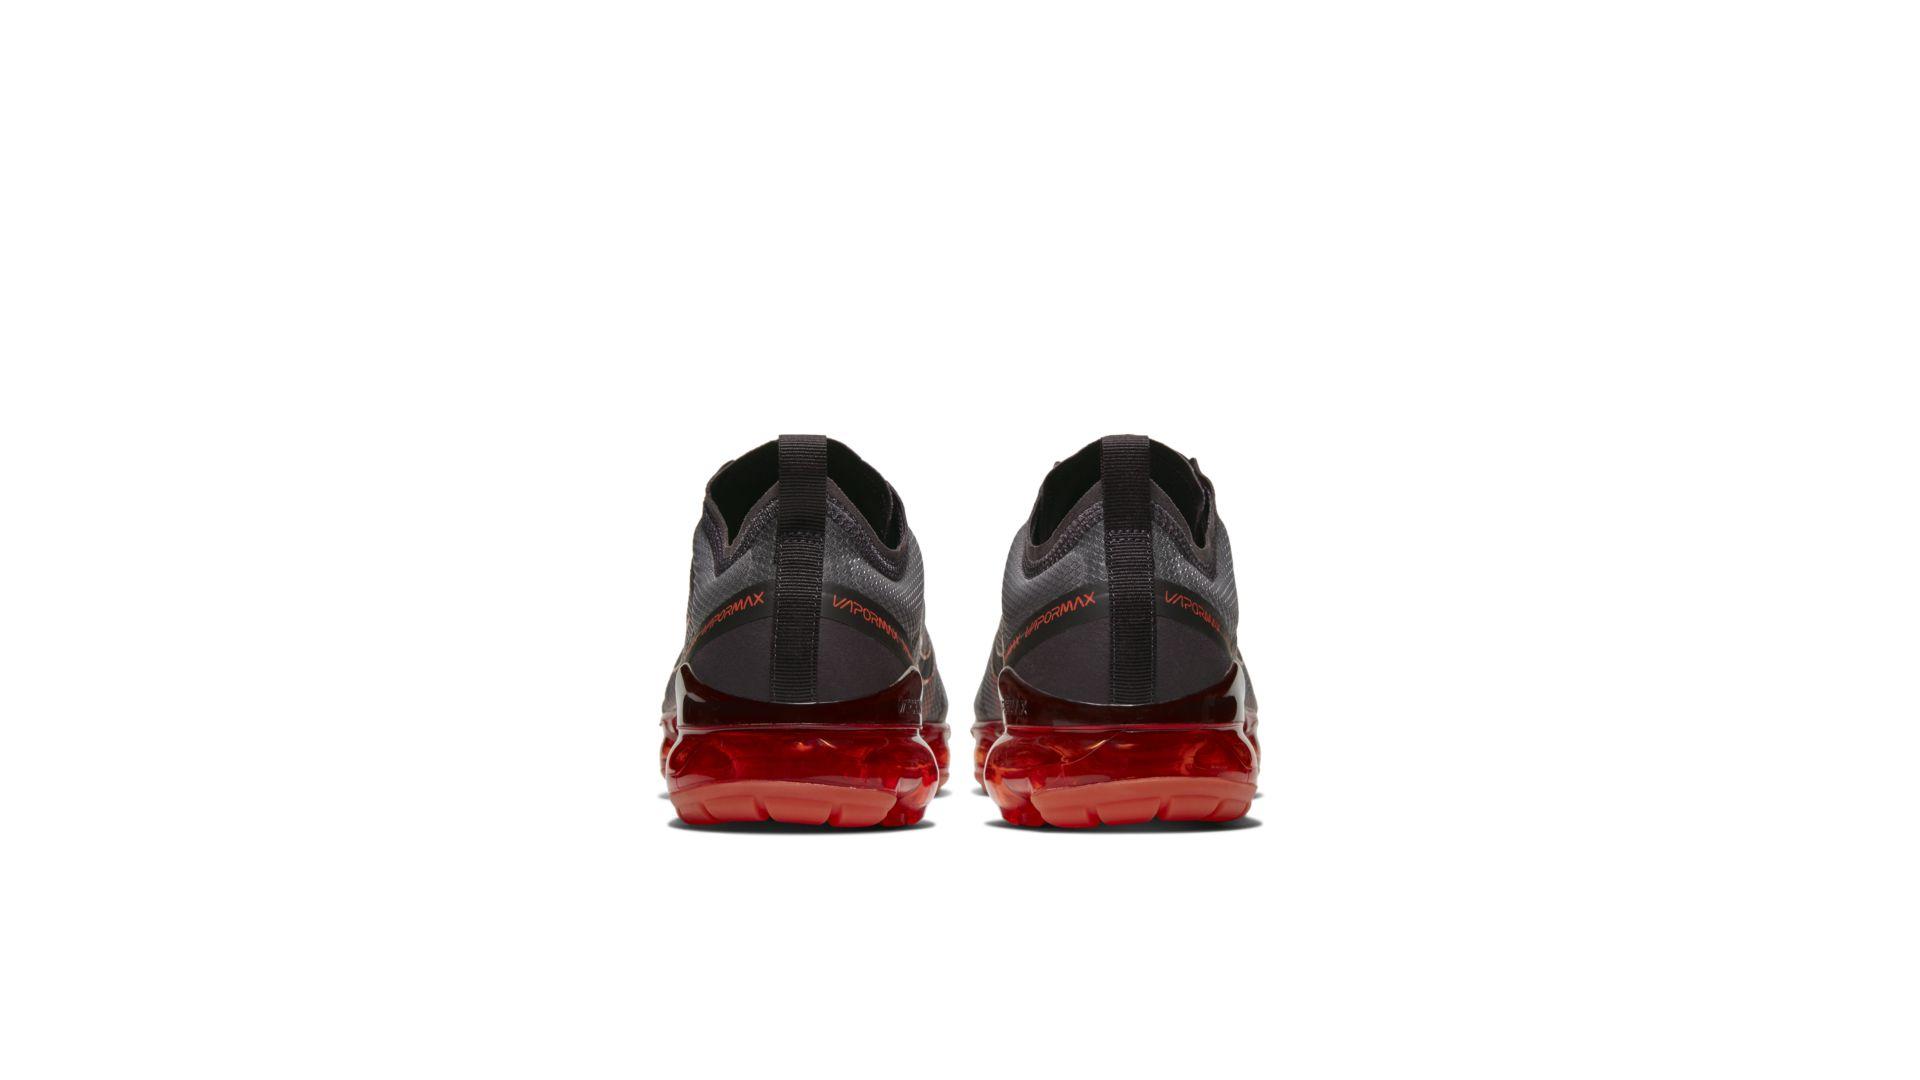 Nike Air VaporMax 2019 Dark Team Red University Red (AR6631-601)